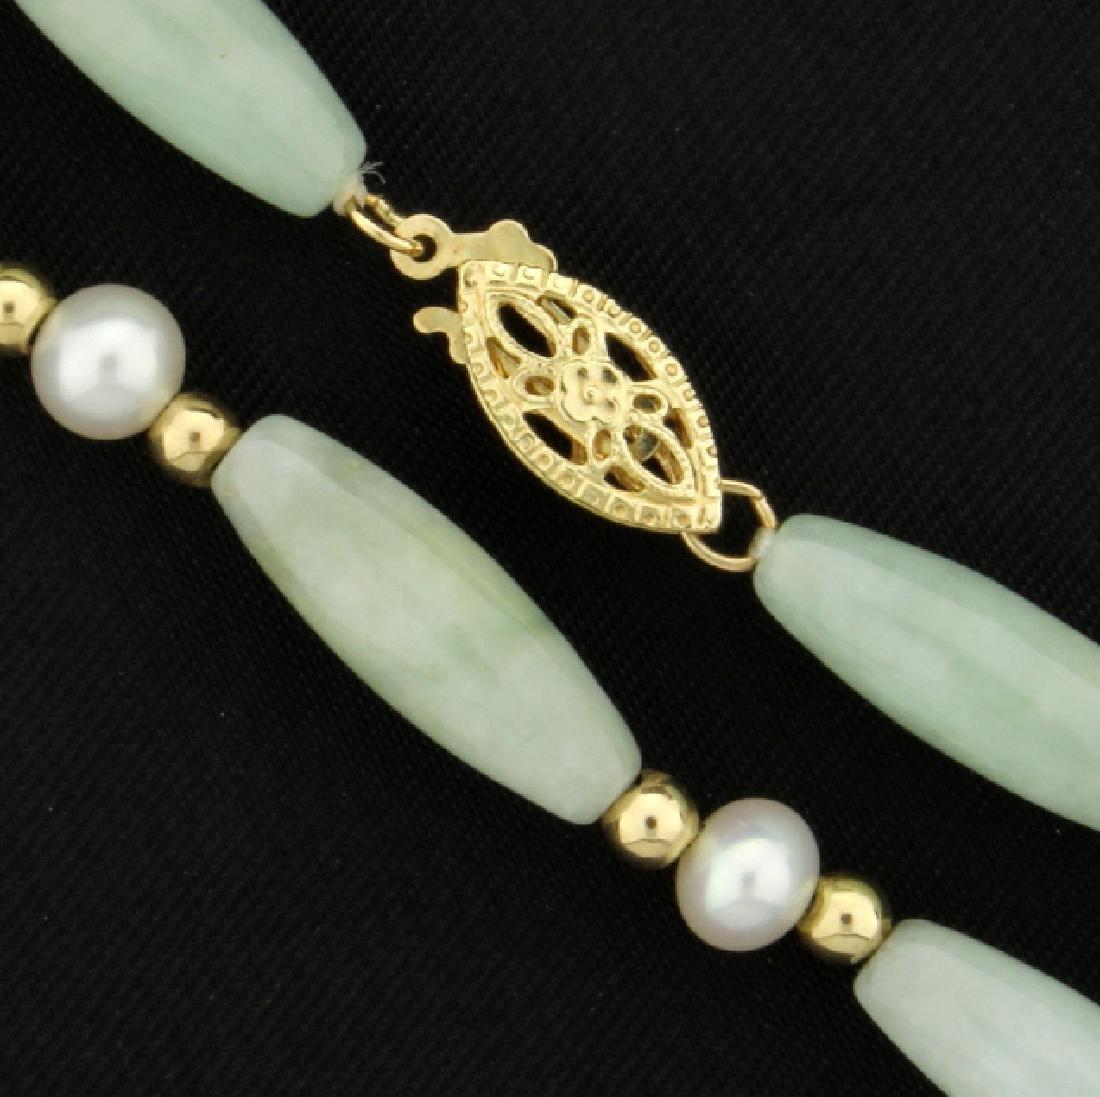 26 1/2 Inch Jade & Pearl Necklace - 2